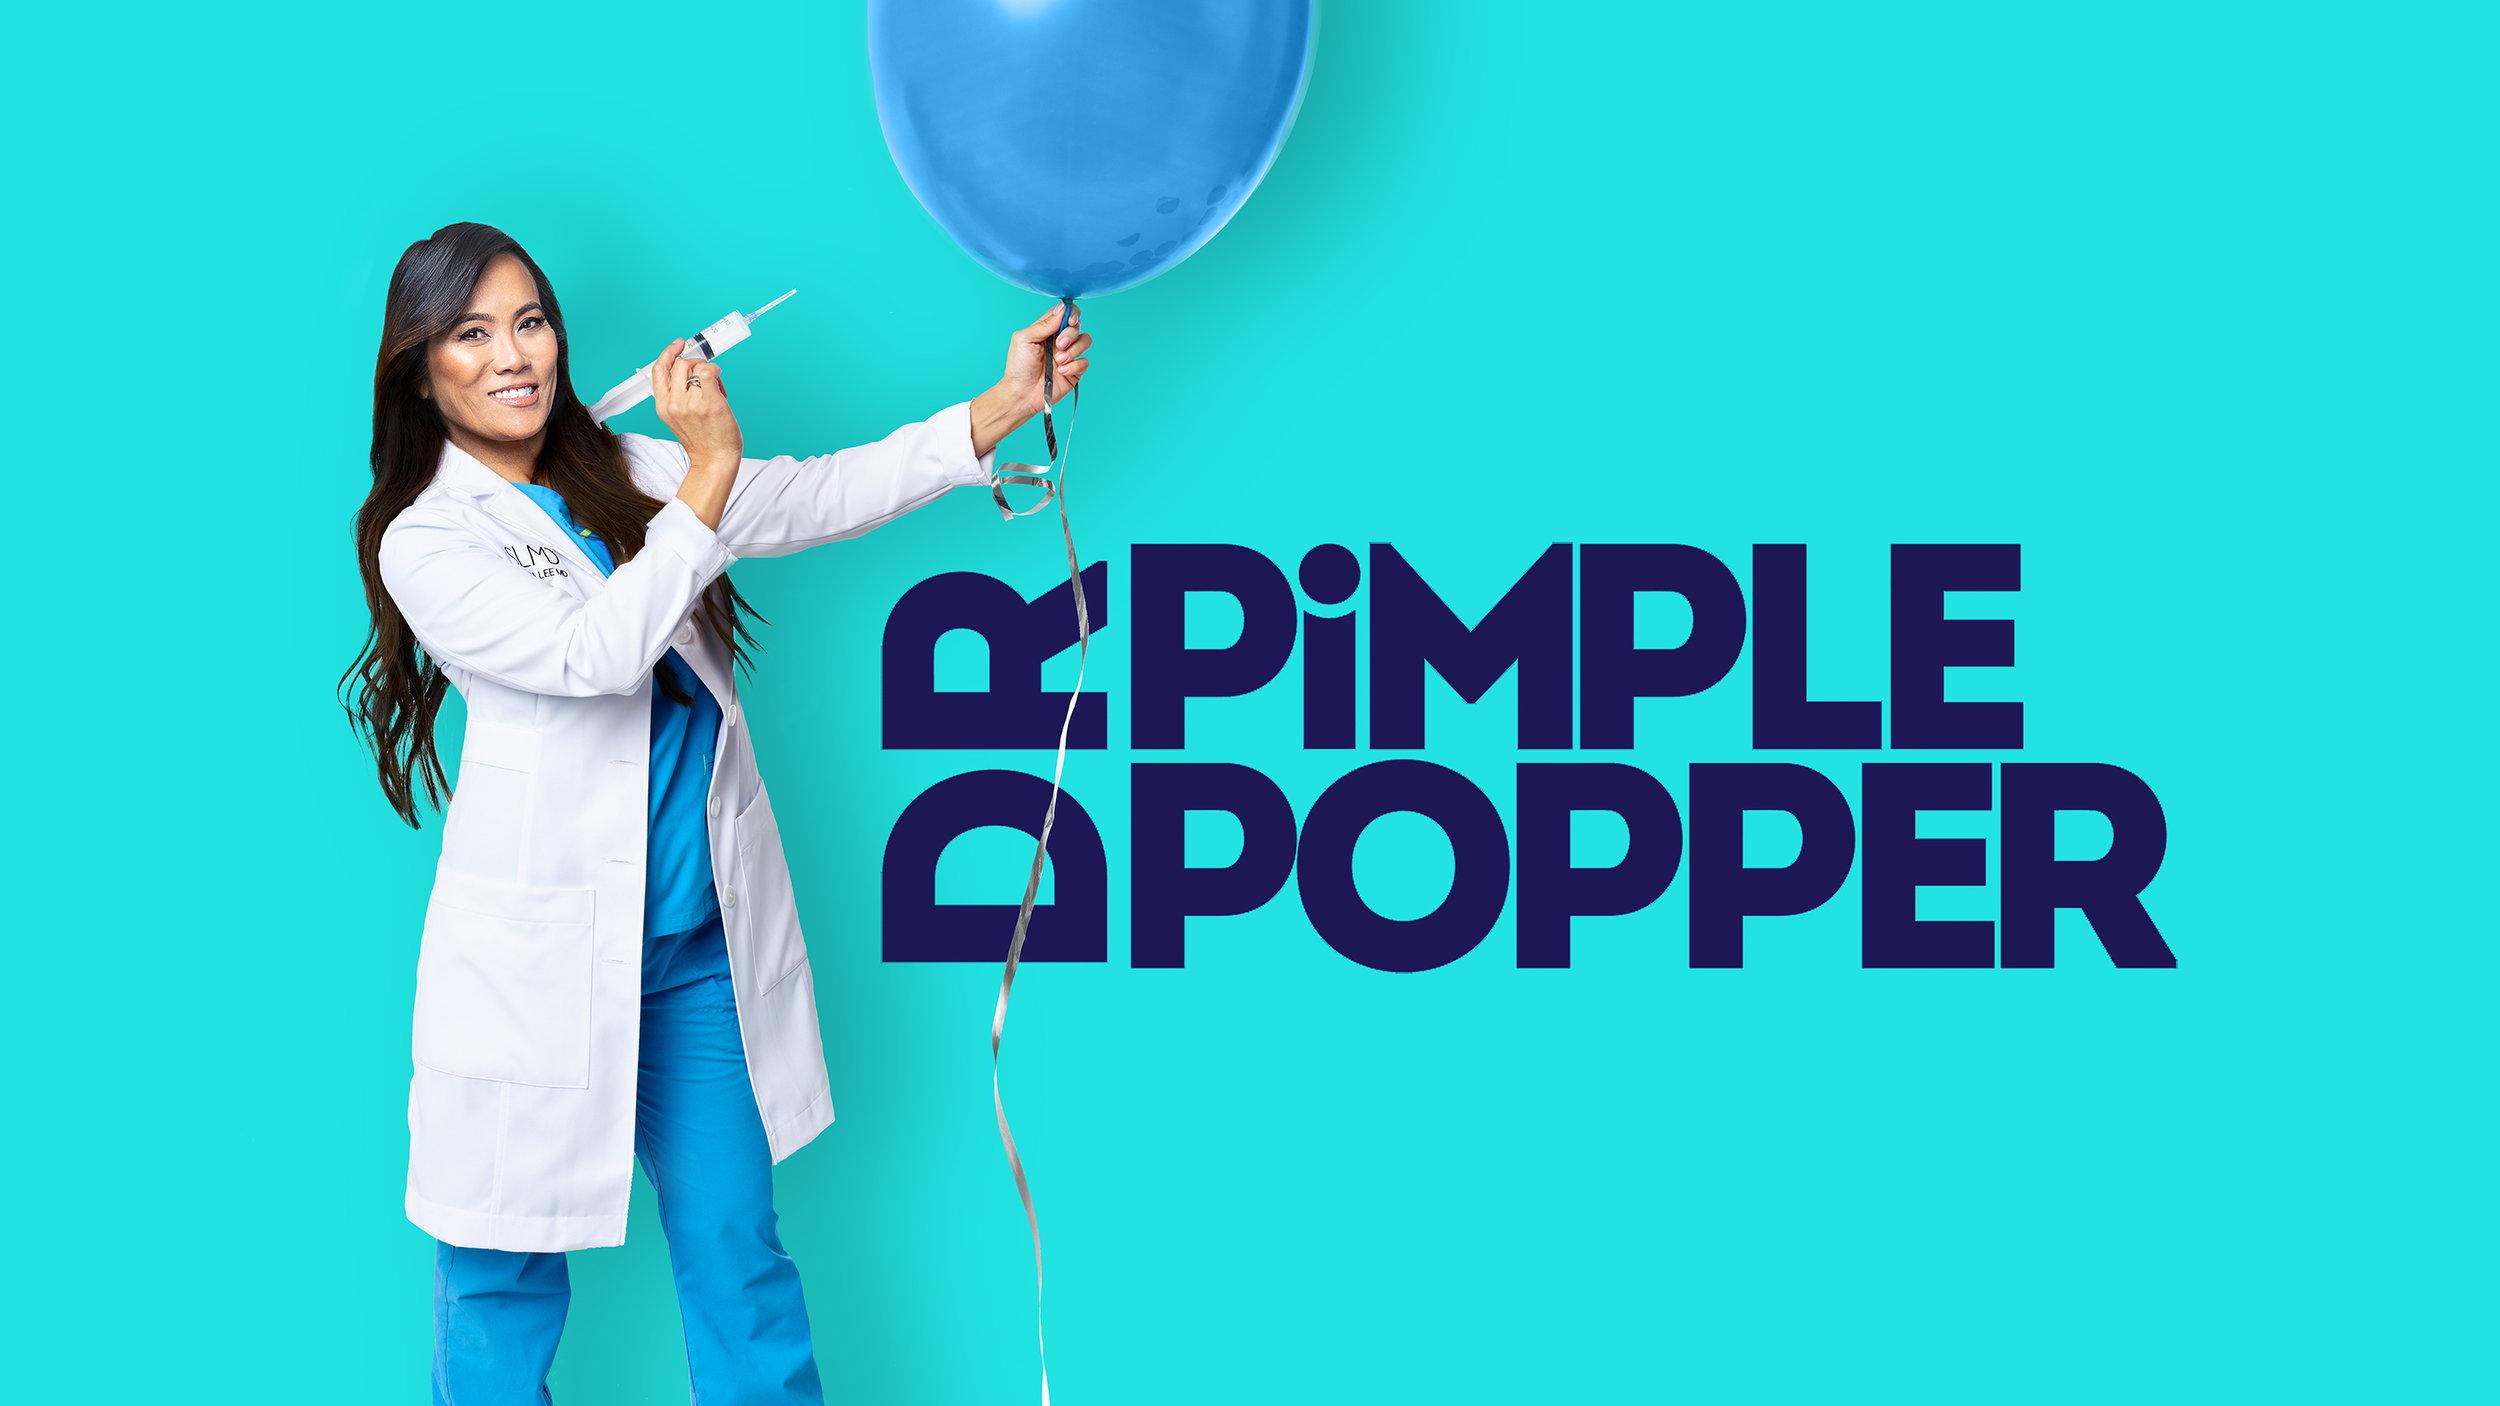 TLCUK_DR PIMPLE POPPER_MASTER_TT_16x9.jpg